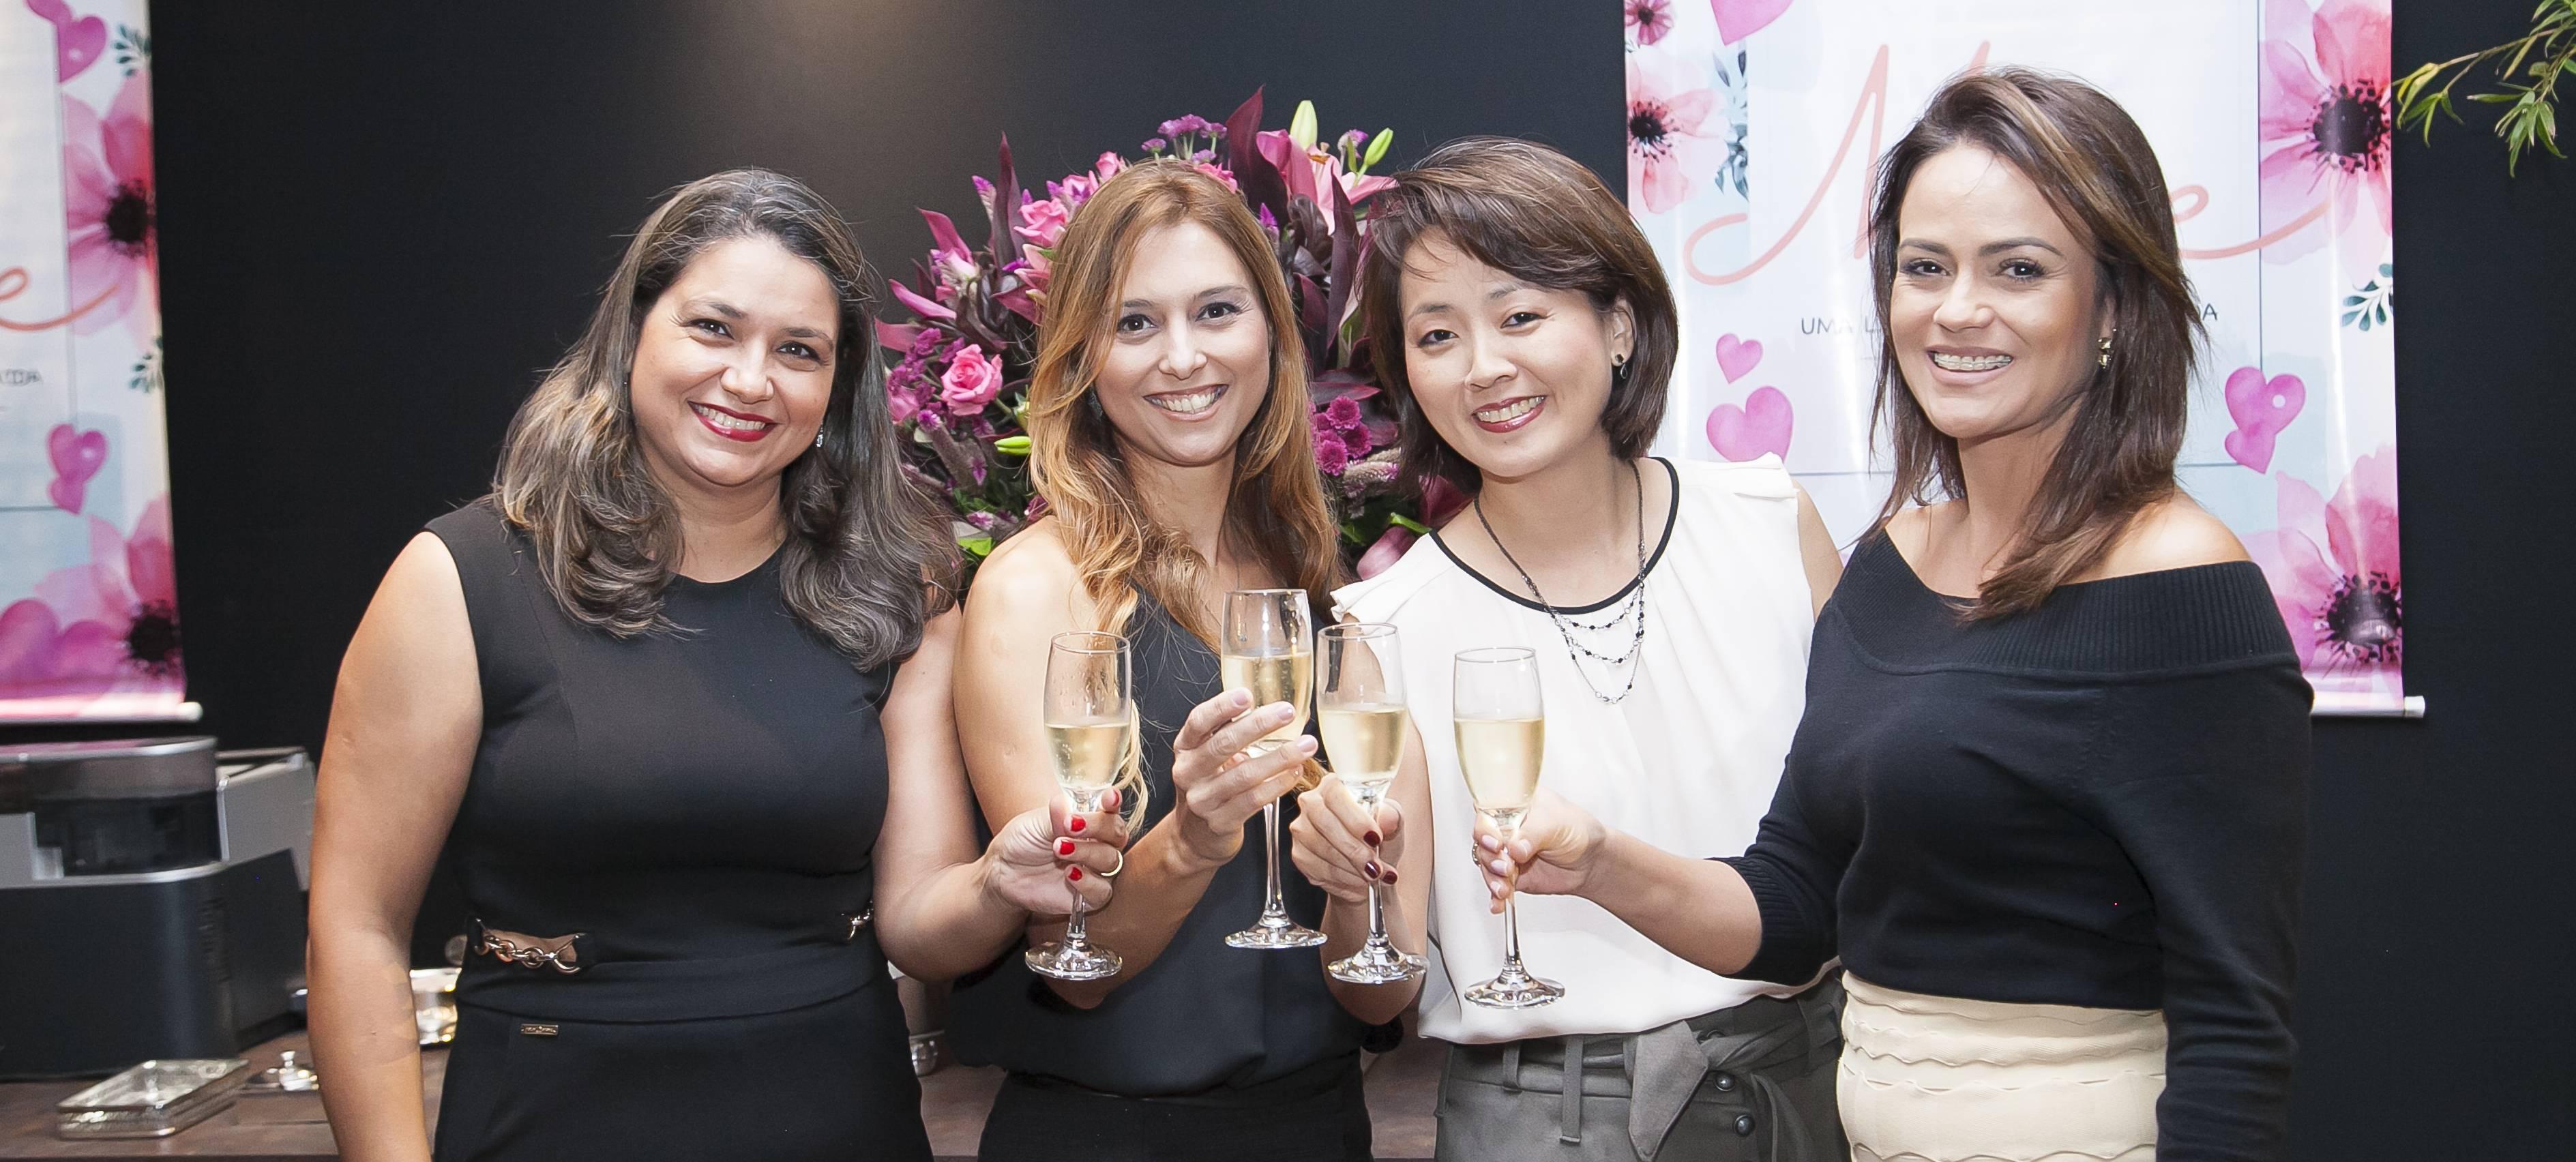 Josane Pereira, Andréa Pereira Leite, Tânia Mogari e Juliana Farias